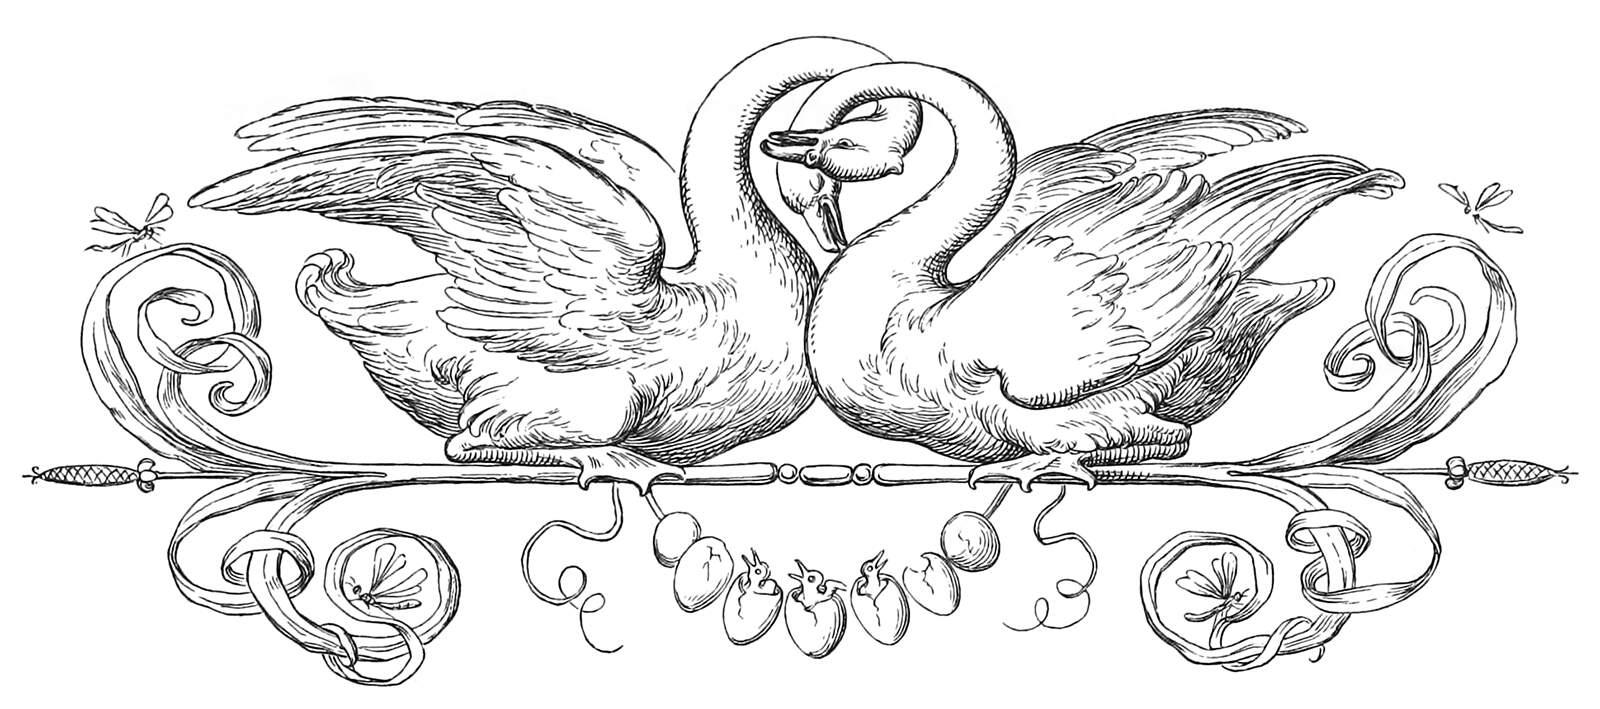 canto-three-1600.jpg (1600×709)